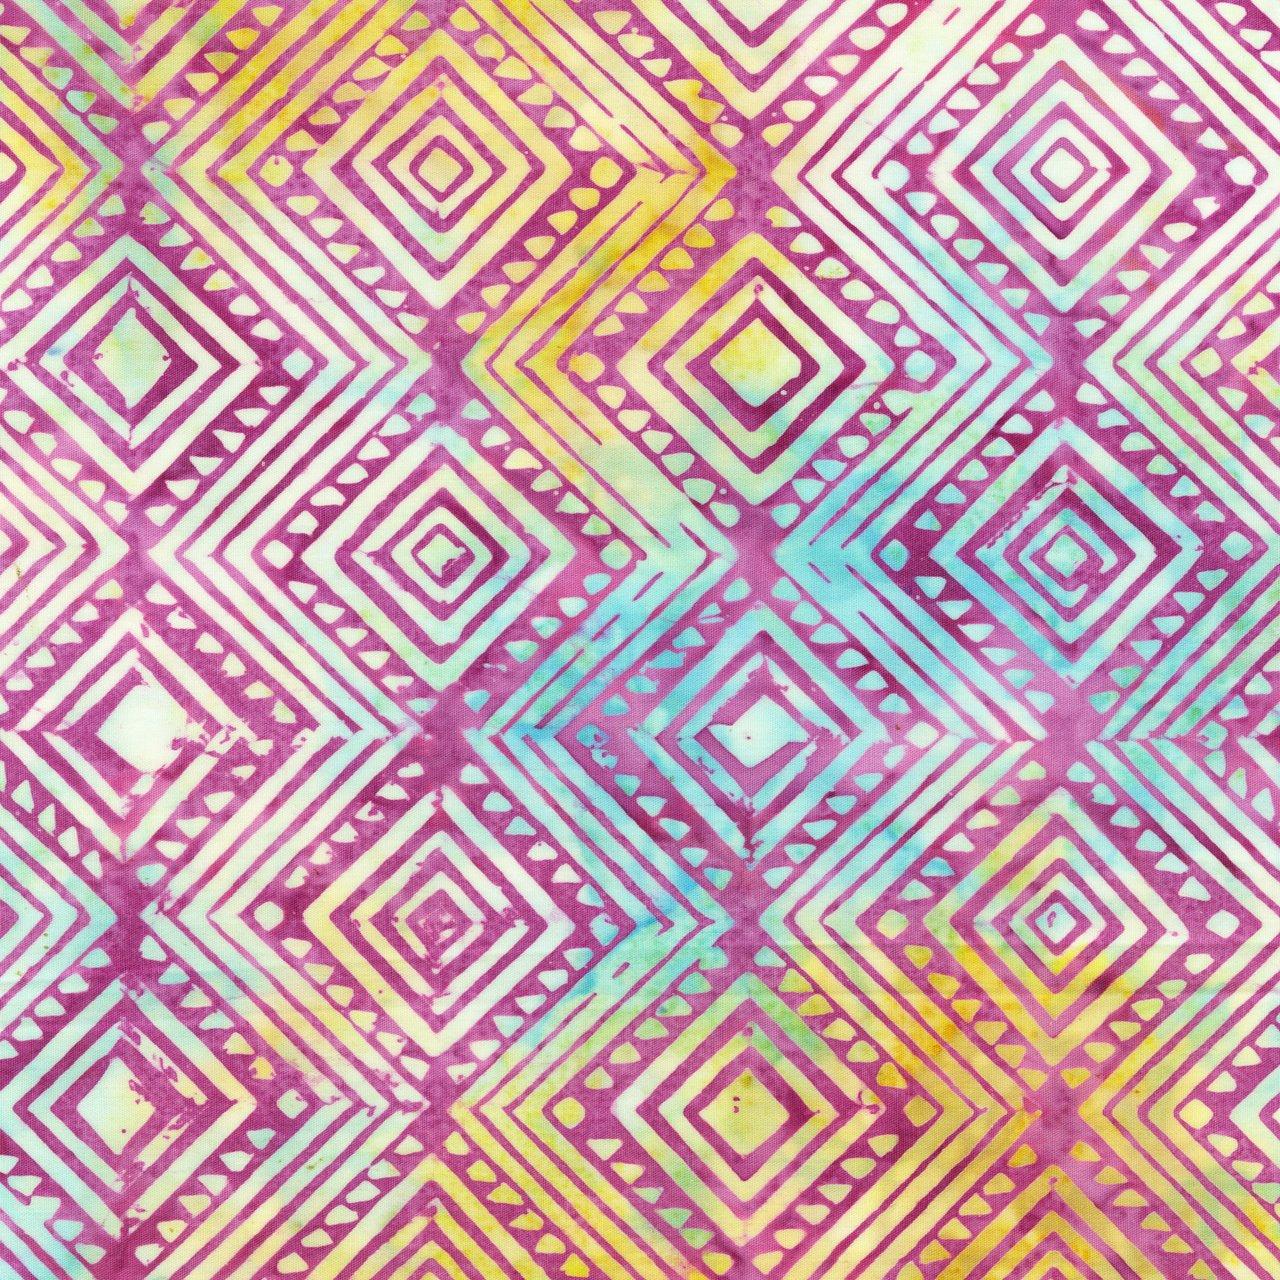 2043Q-X Multi Art Inspired Light Iris, 1924 by Anthology Fabrics